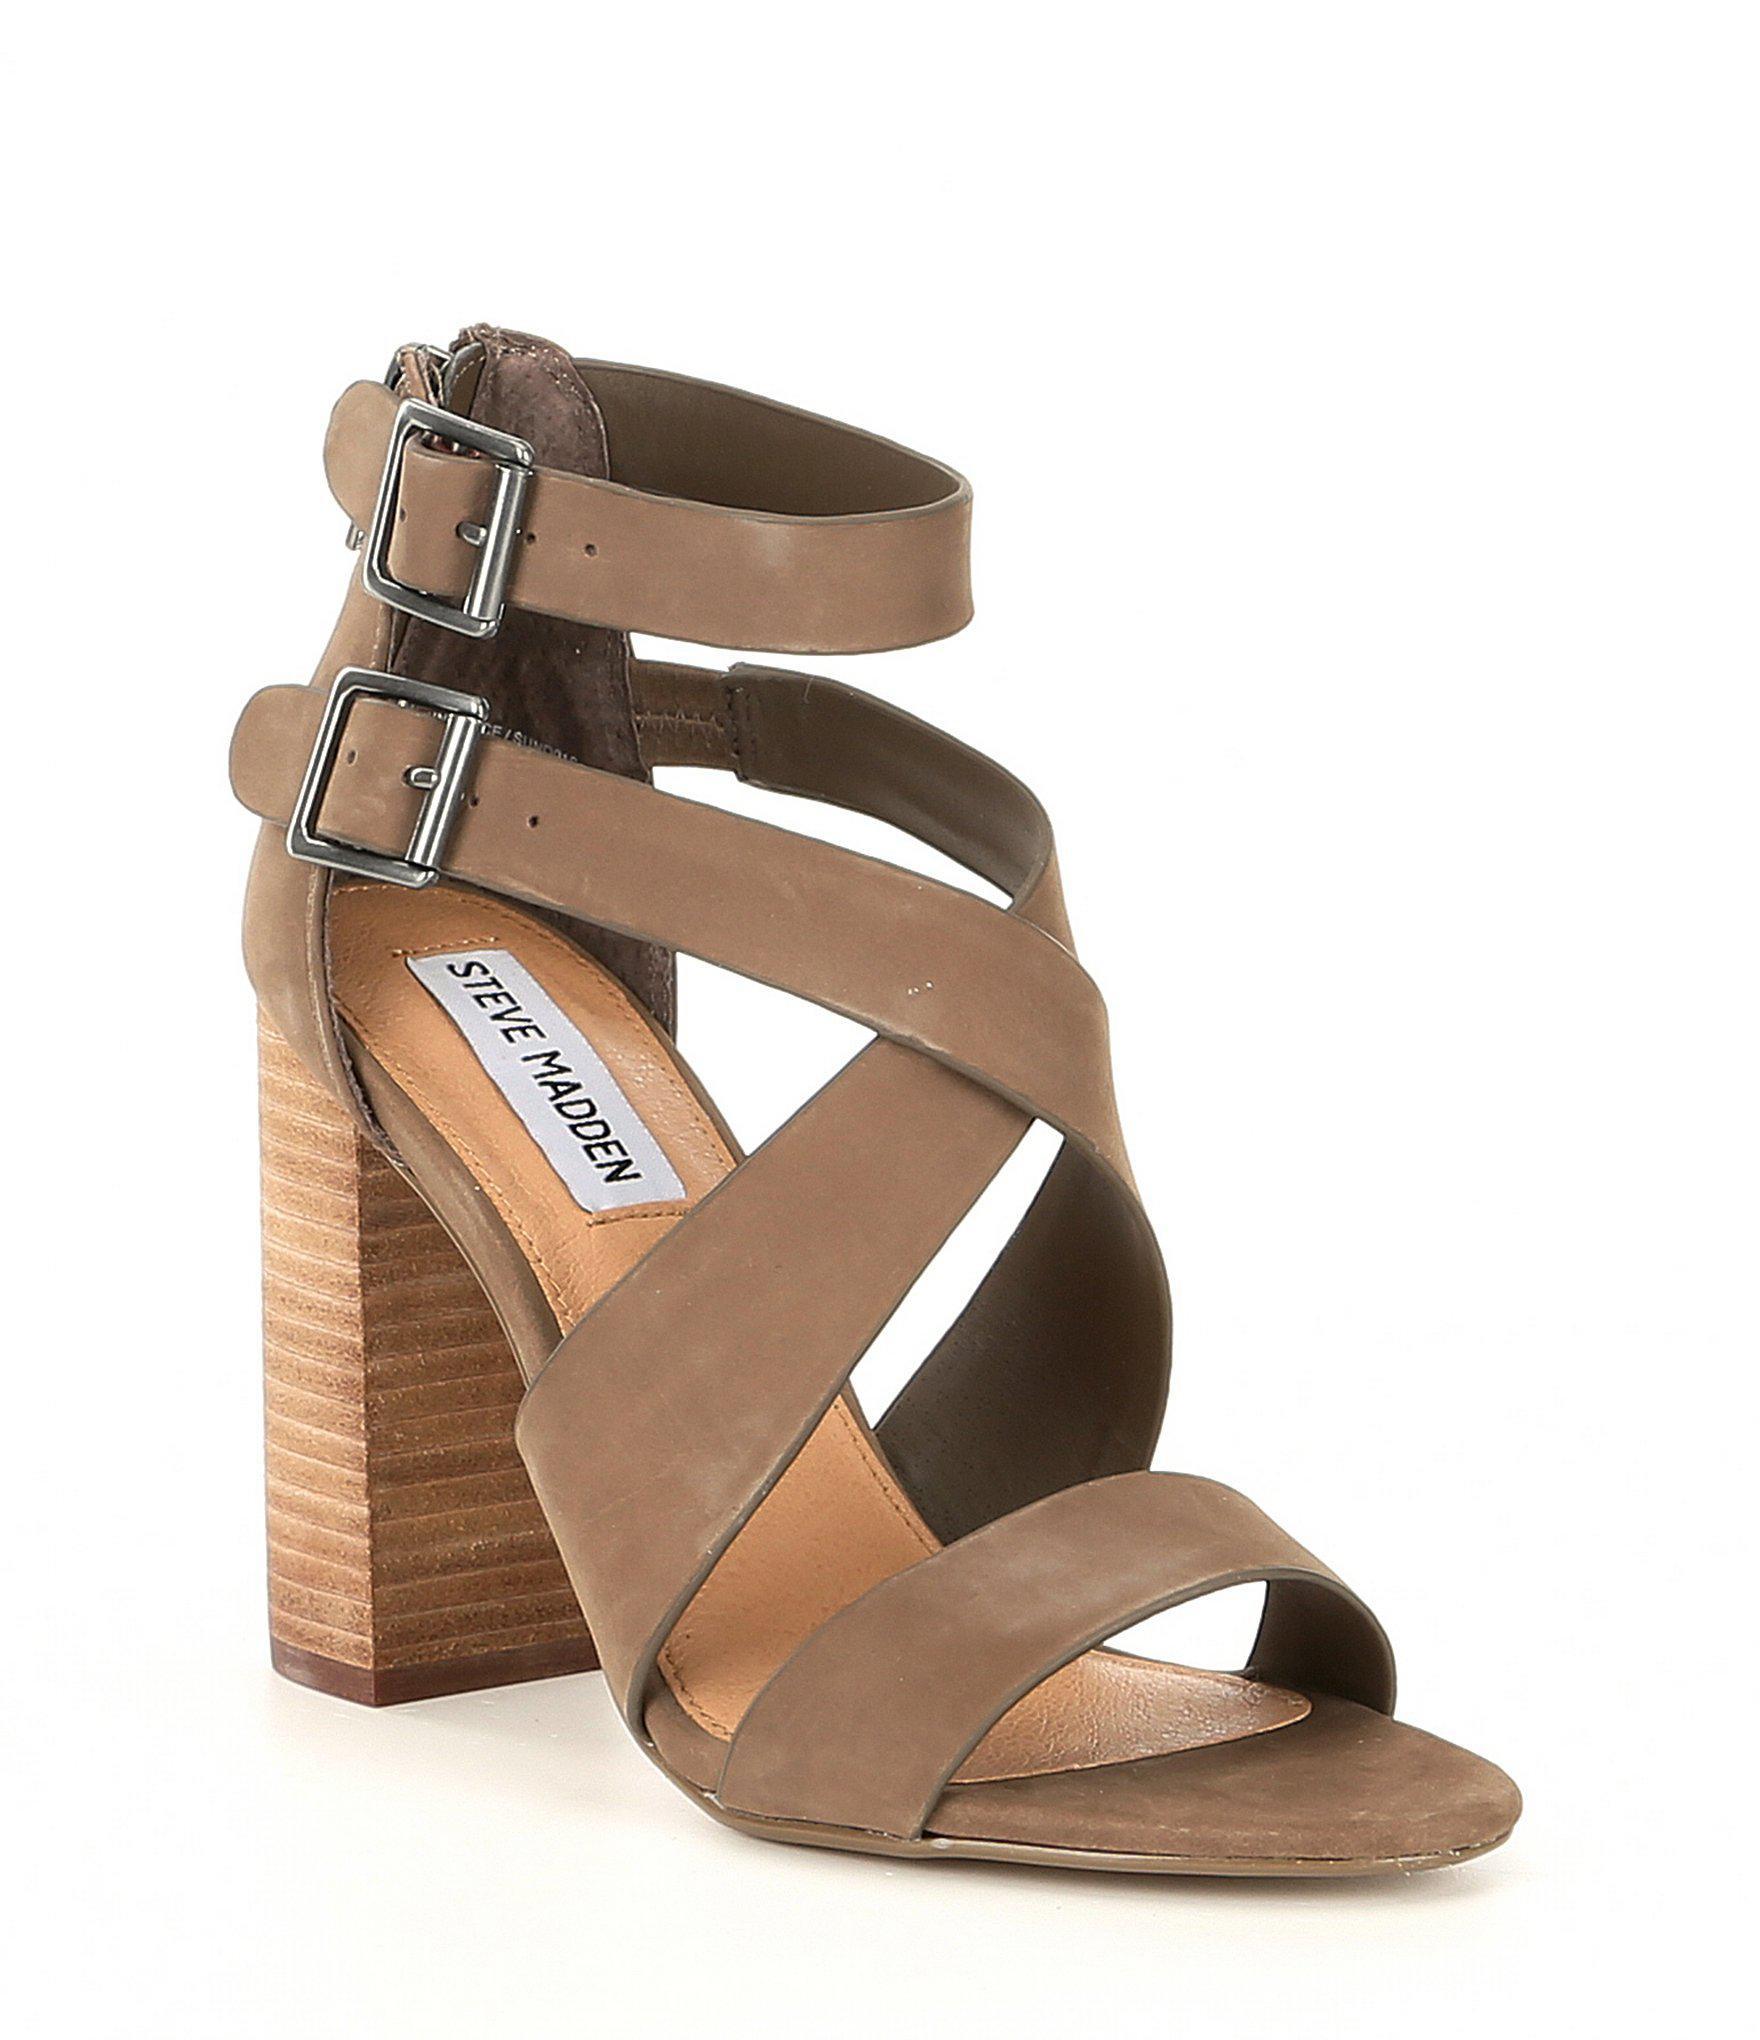 6d15d8b2c42 Lyst - Steve Madden Sundance Suede Ankle-strap Sandals in Brown